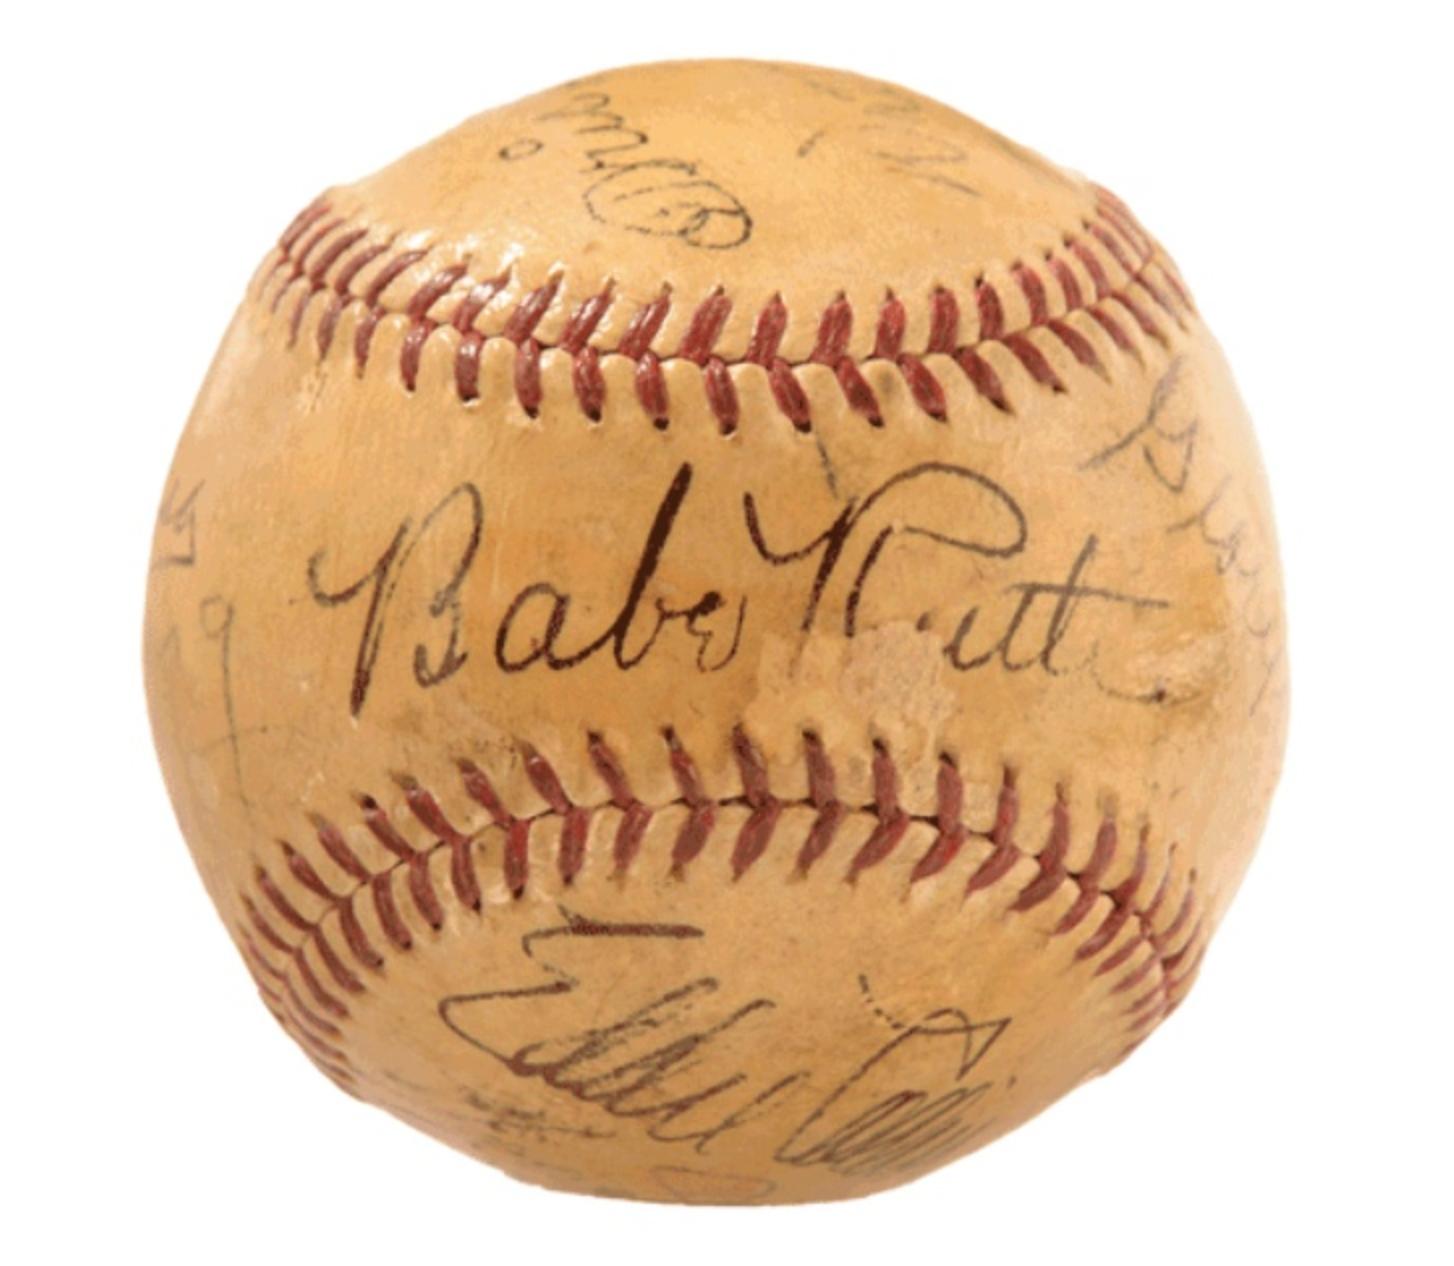 11 Original Hall of Fame Inductees Signed Baseball (1939)